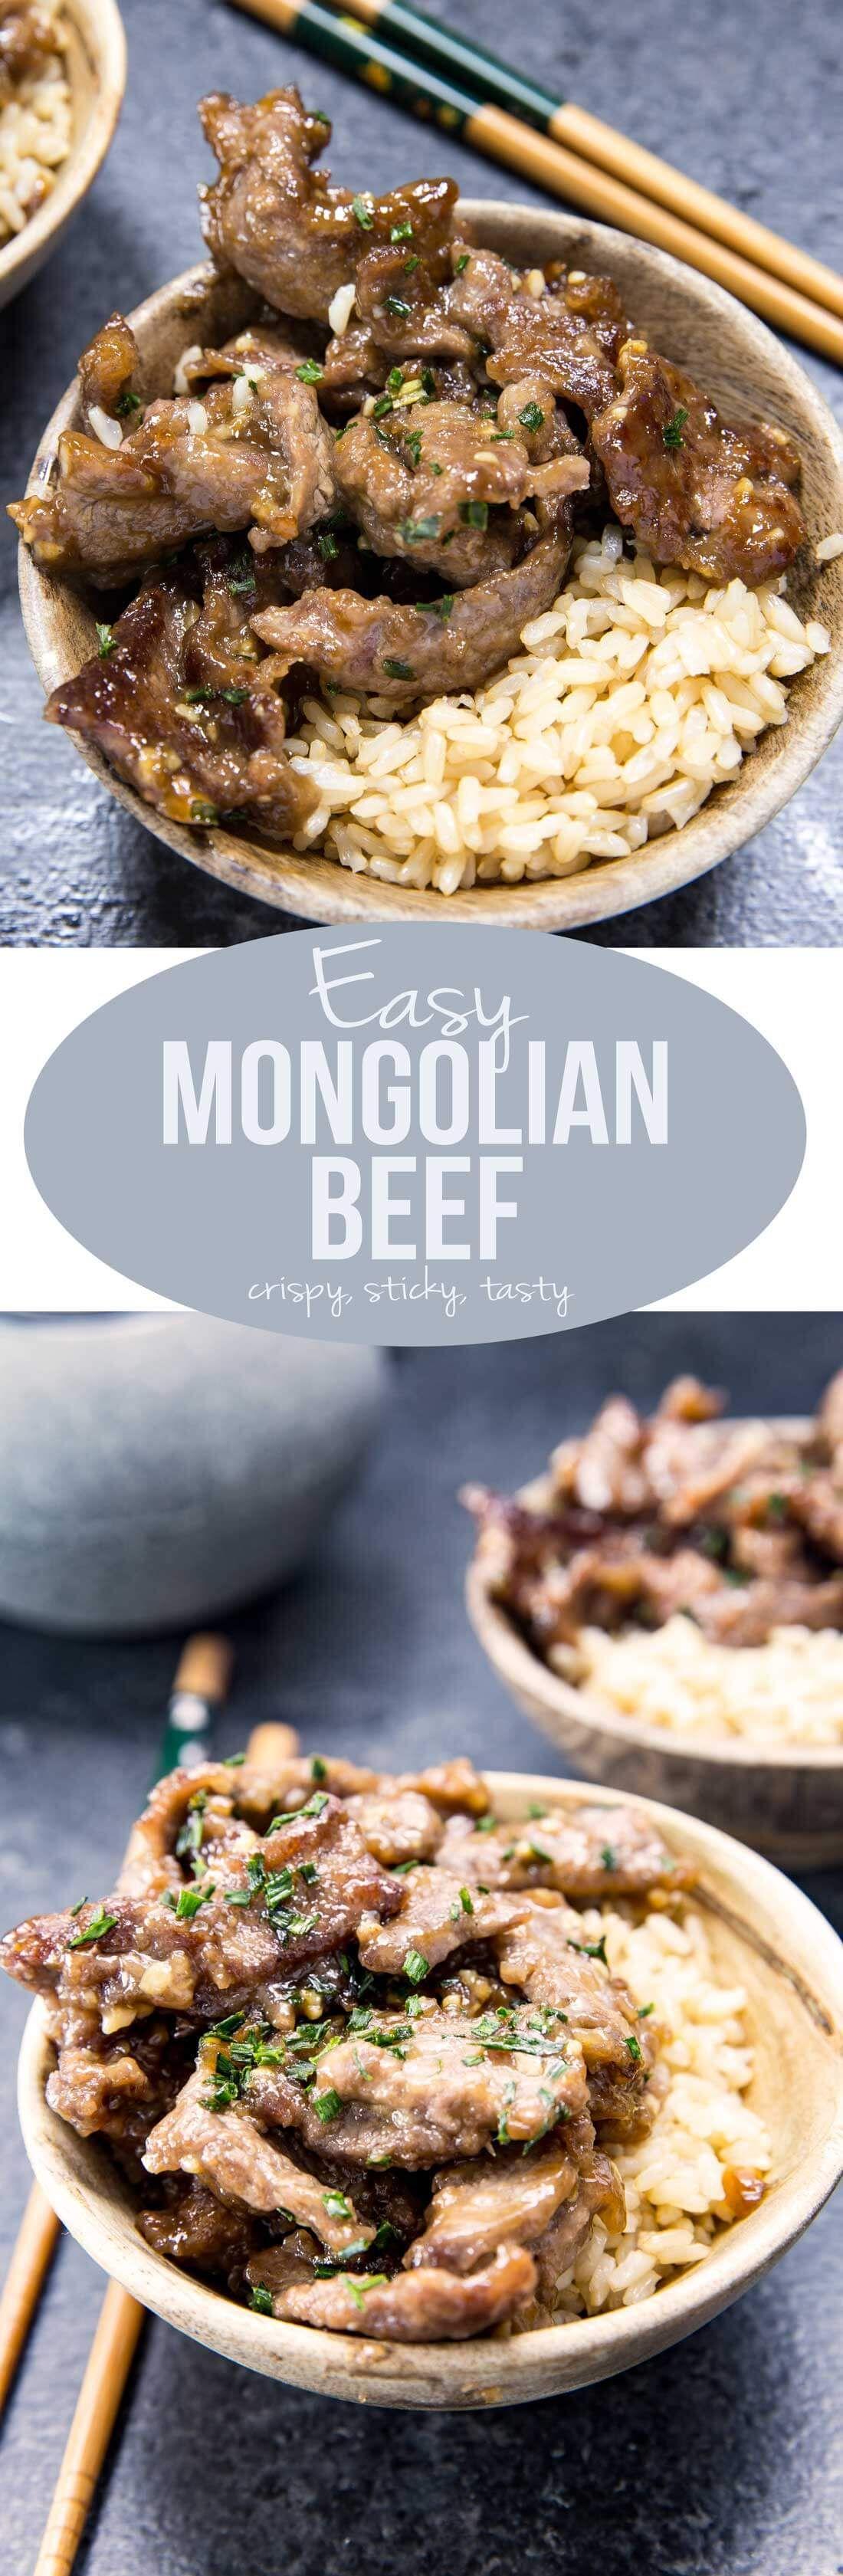 Easy Mongolian Beef Easy Peasy Meals Recipe Recipes Easy Mongolian Beef Beef Recipes